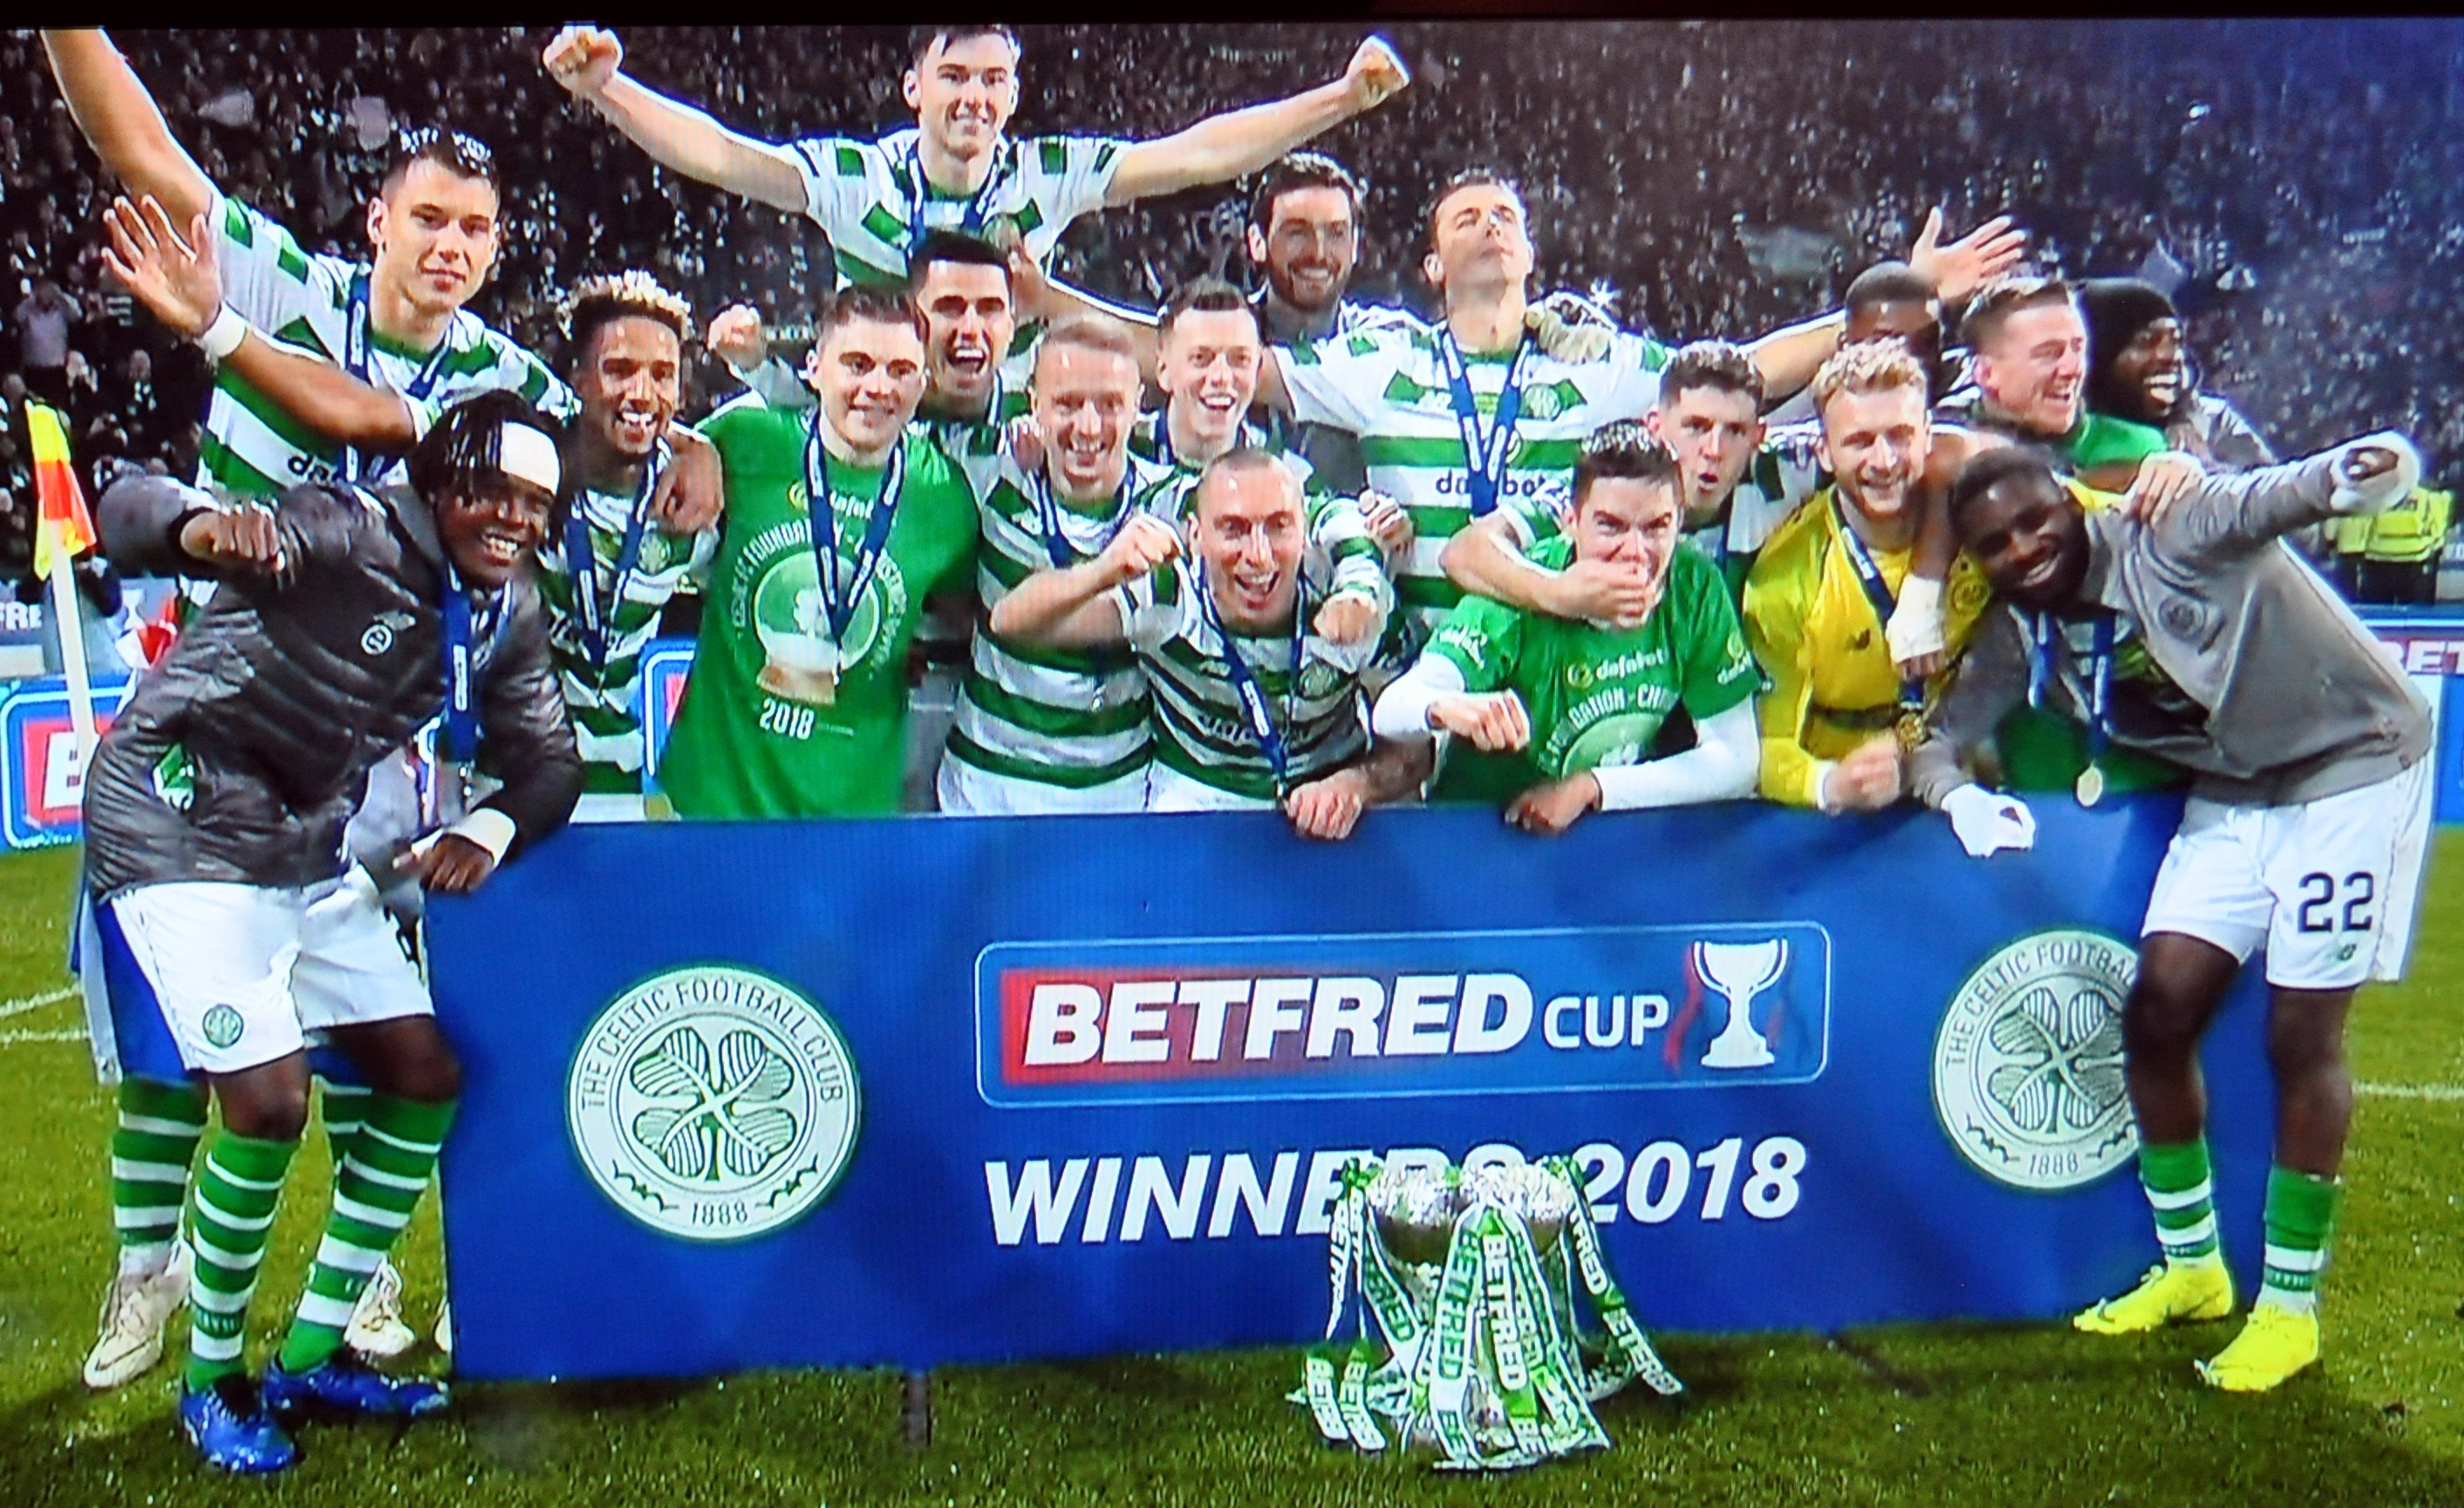 POLITICS: Celtic manager rails against government and media 'barrage of hypocrisy' over Dubai trip